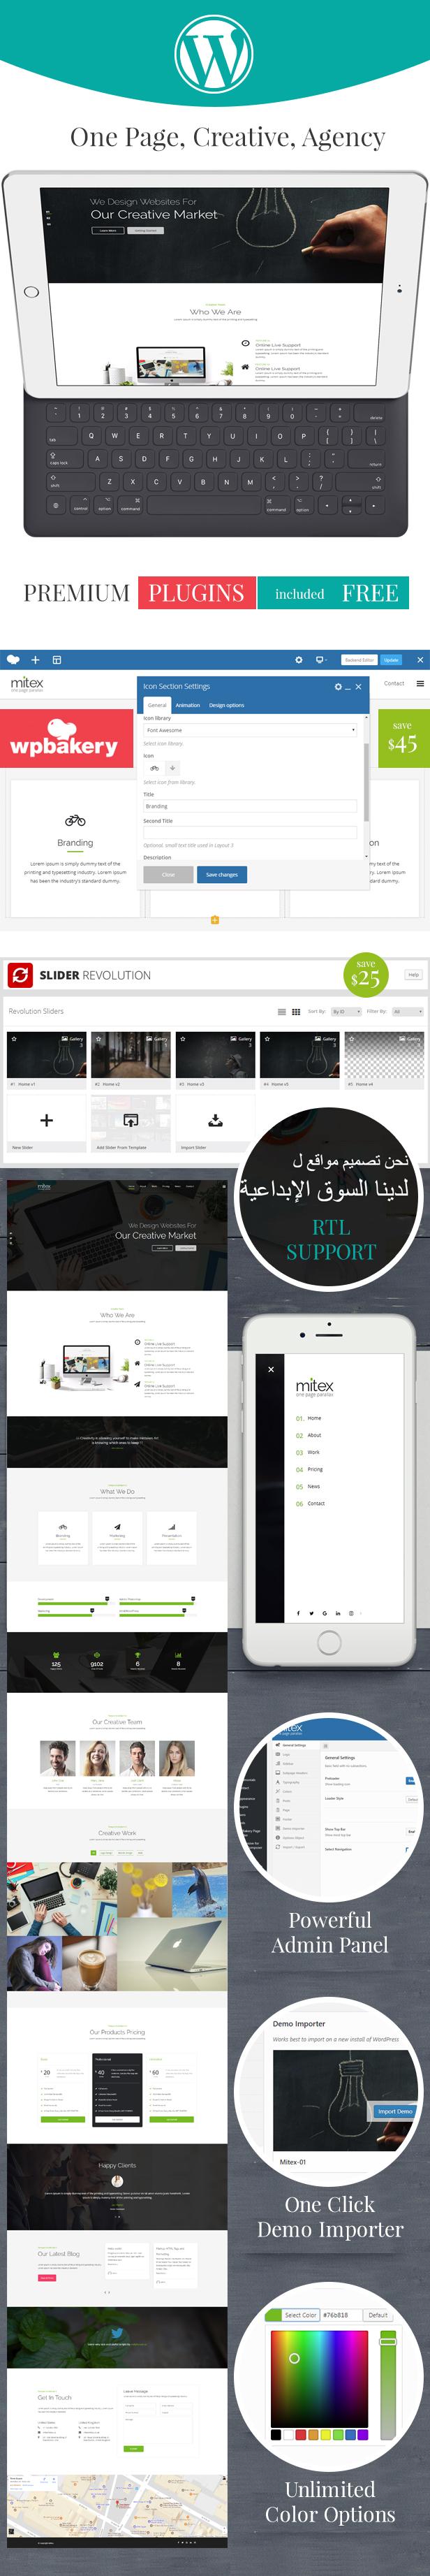 Mitex - One Page WordPress Theme - 2